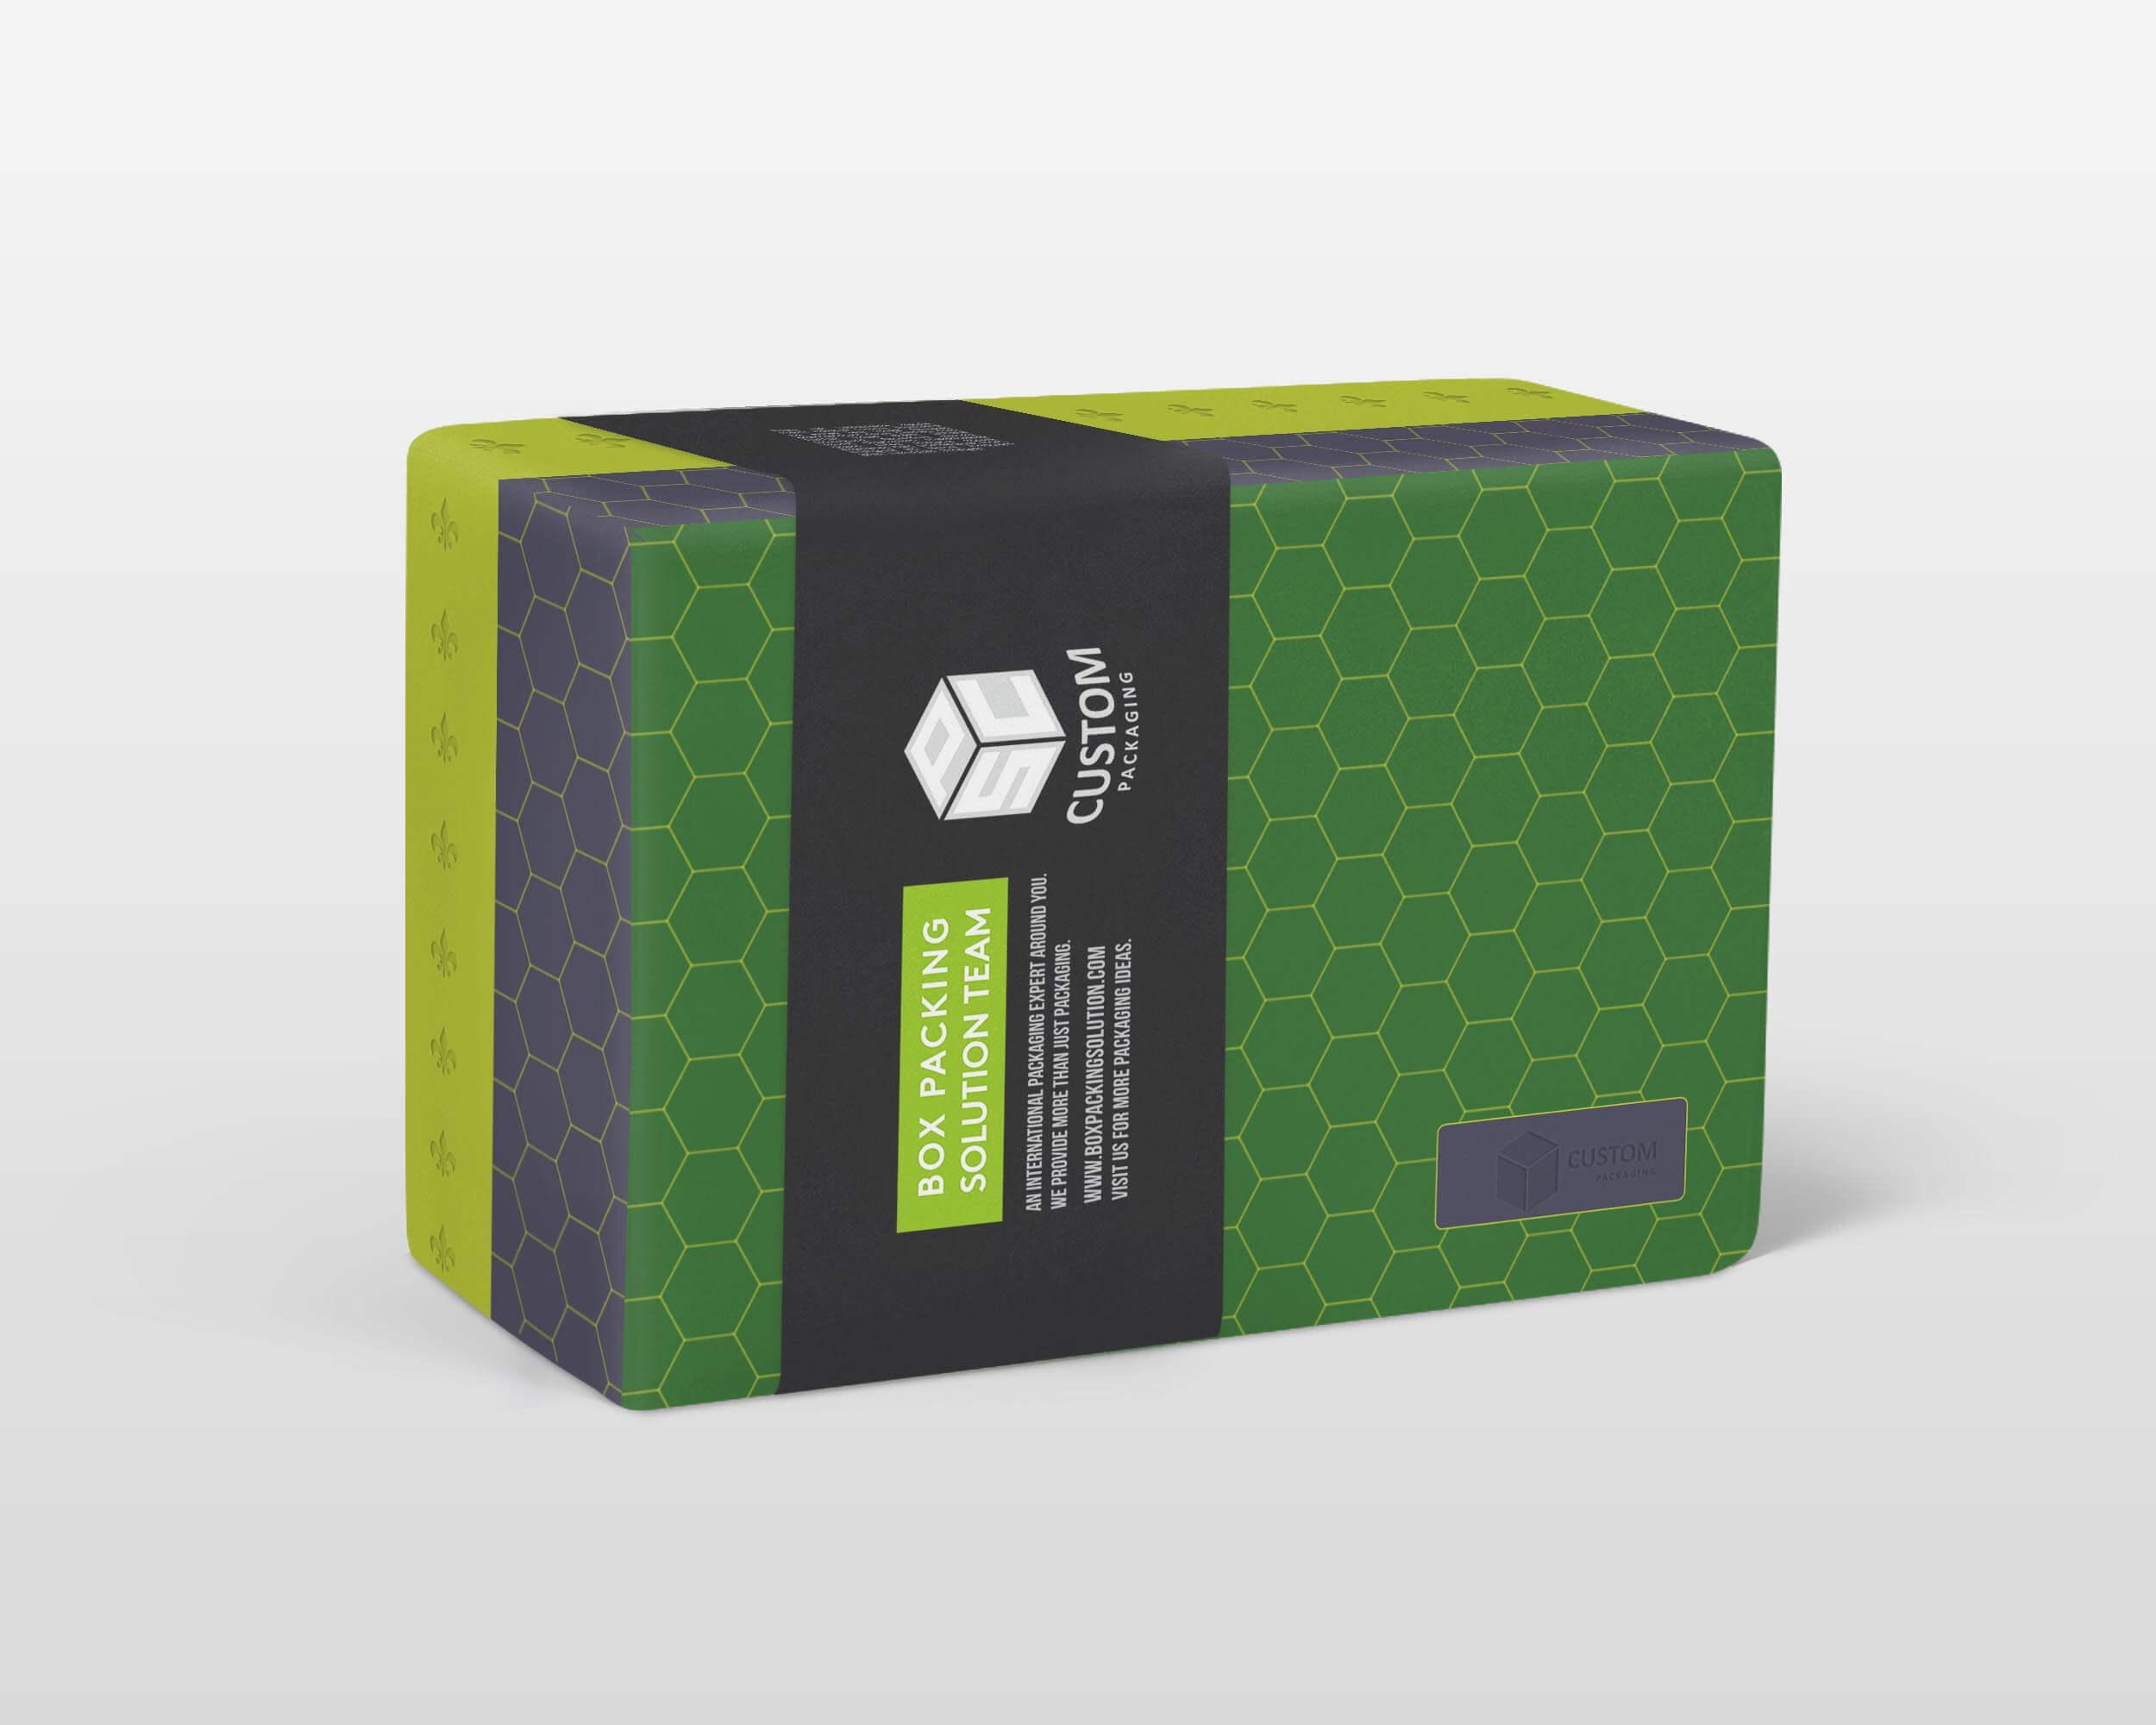 customized rigid box with sleeve mock-up